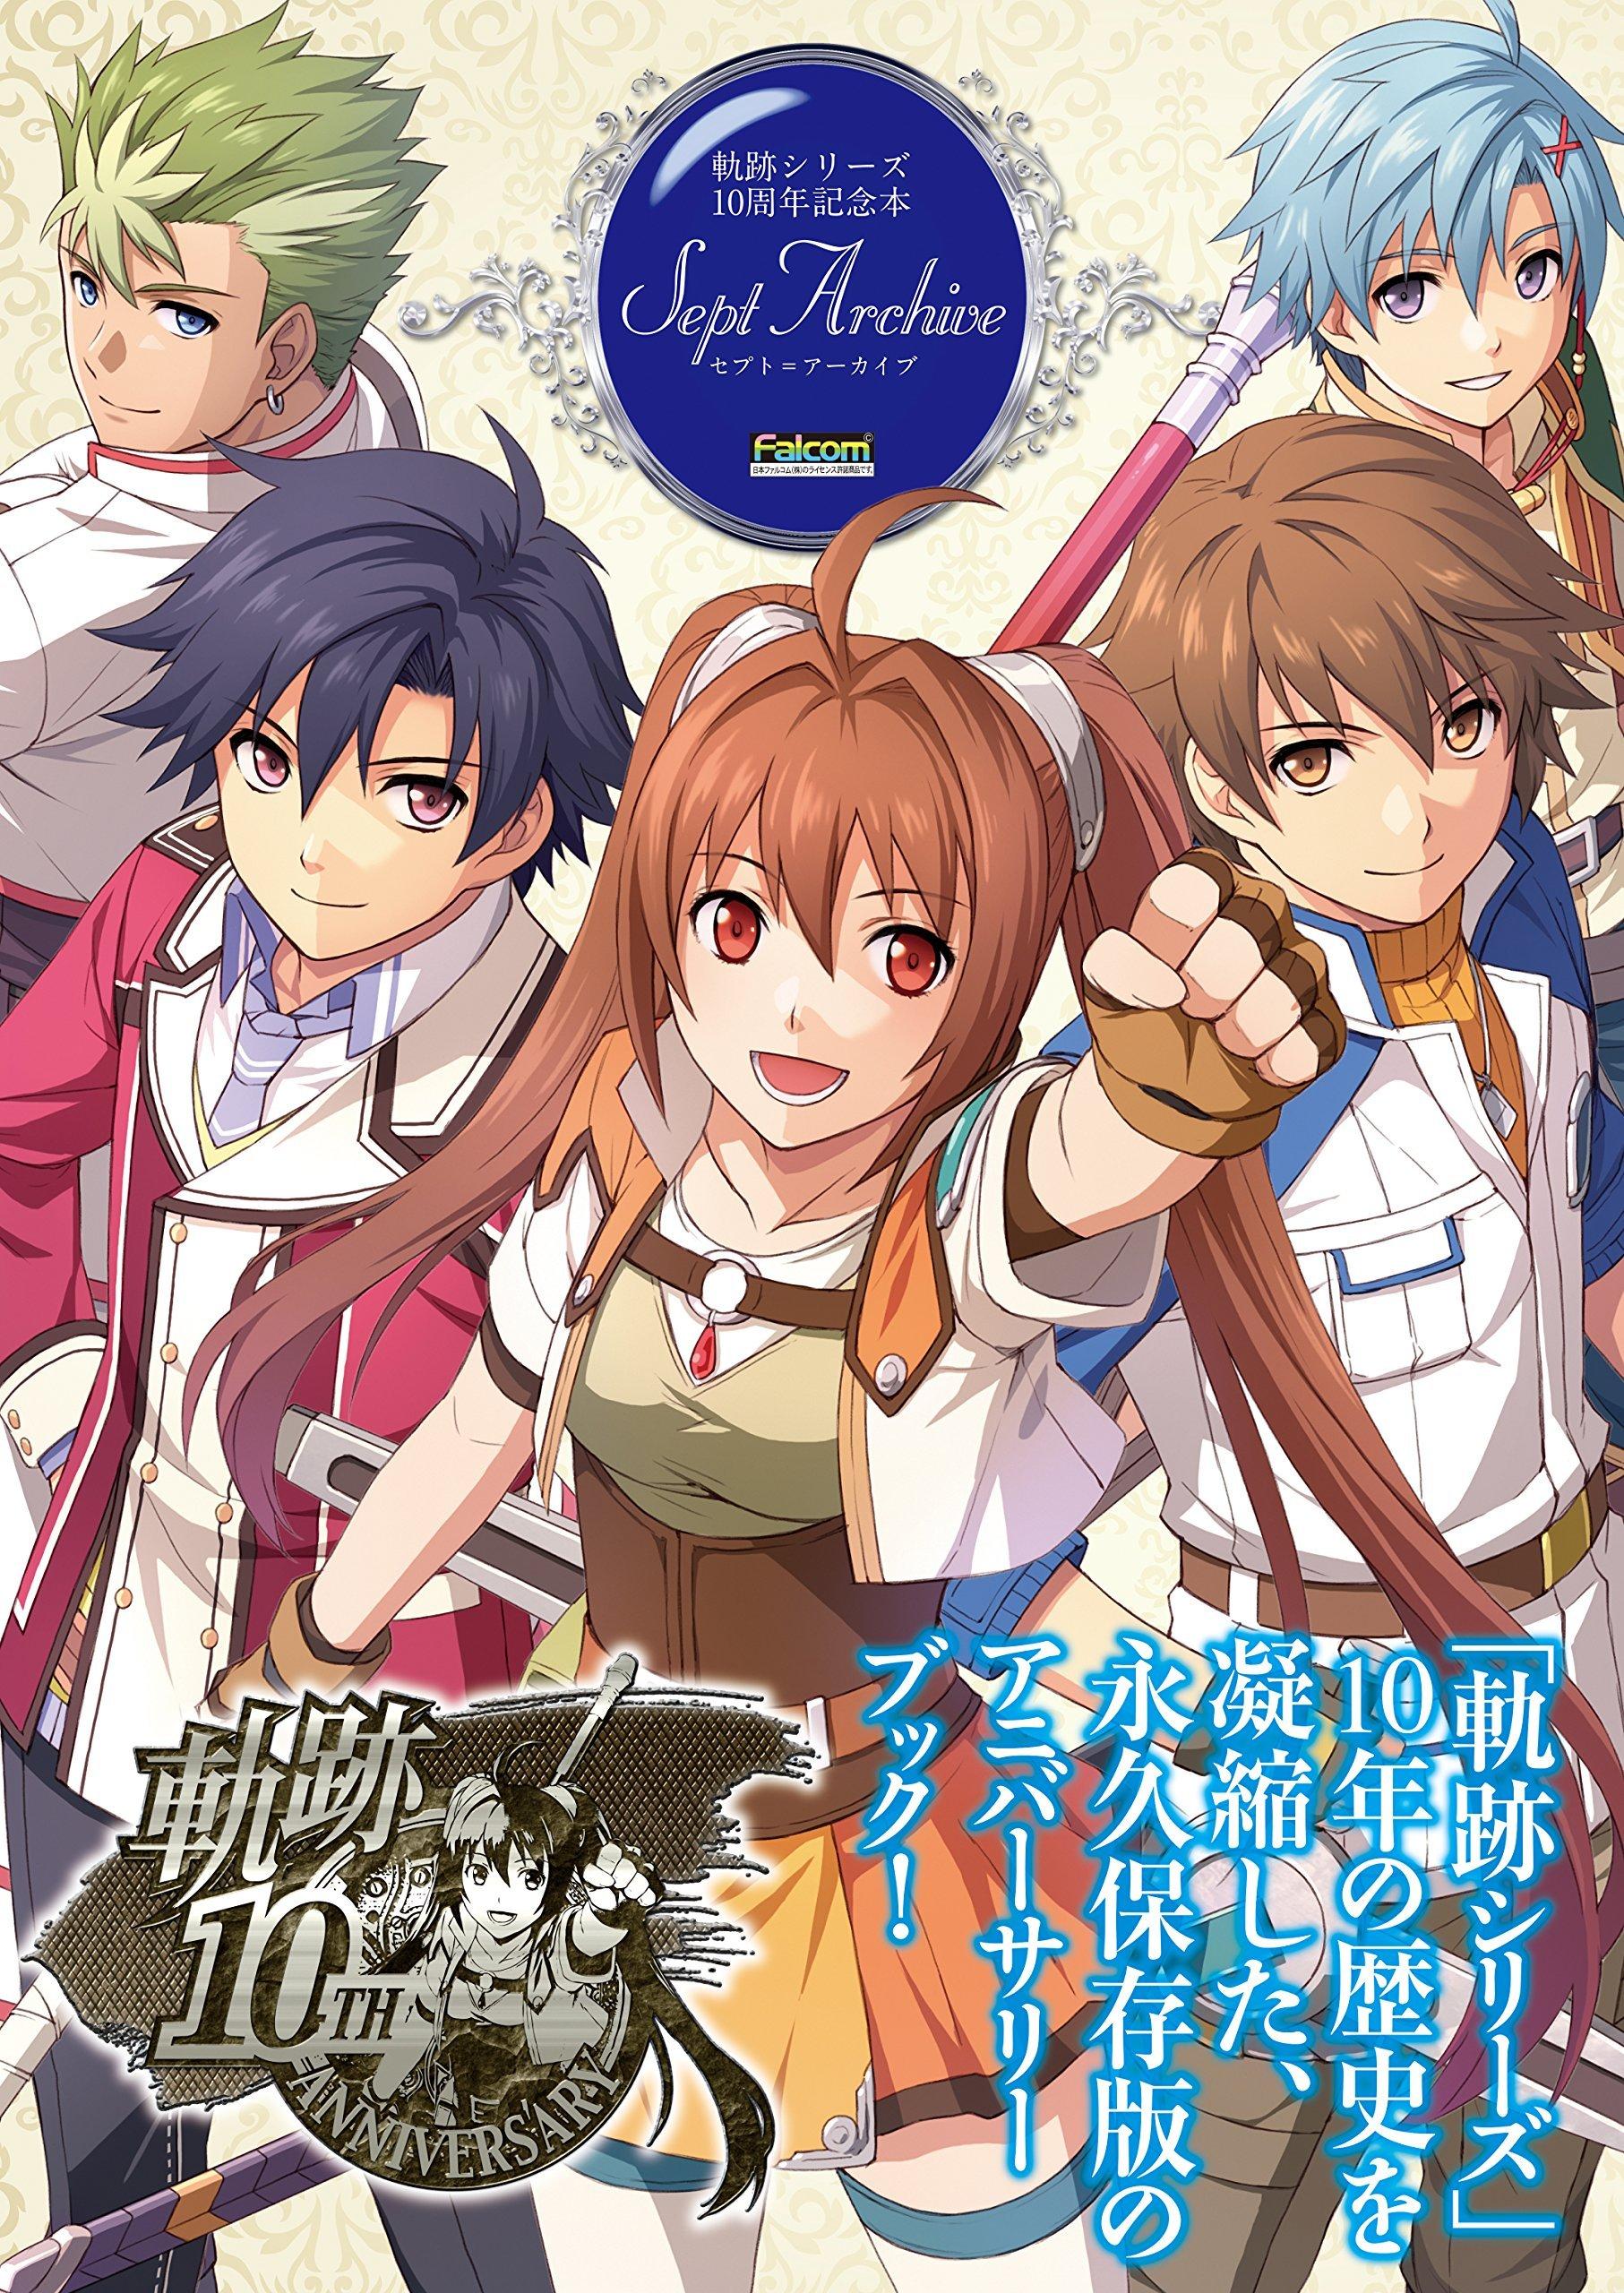 Kiseki Series 10th Anniversary Book Sept = Archive